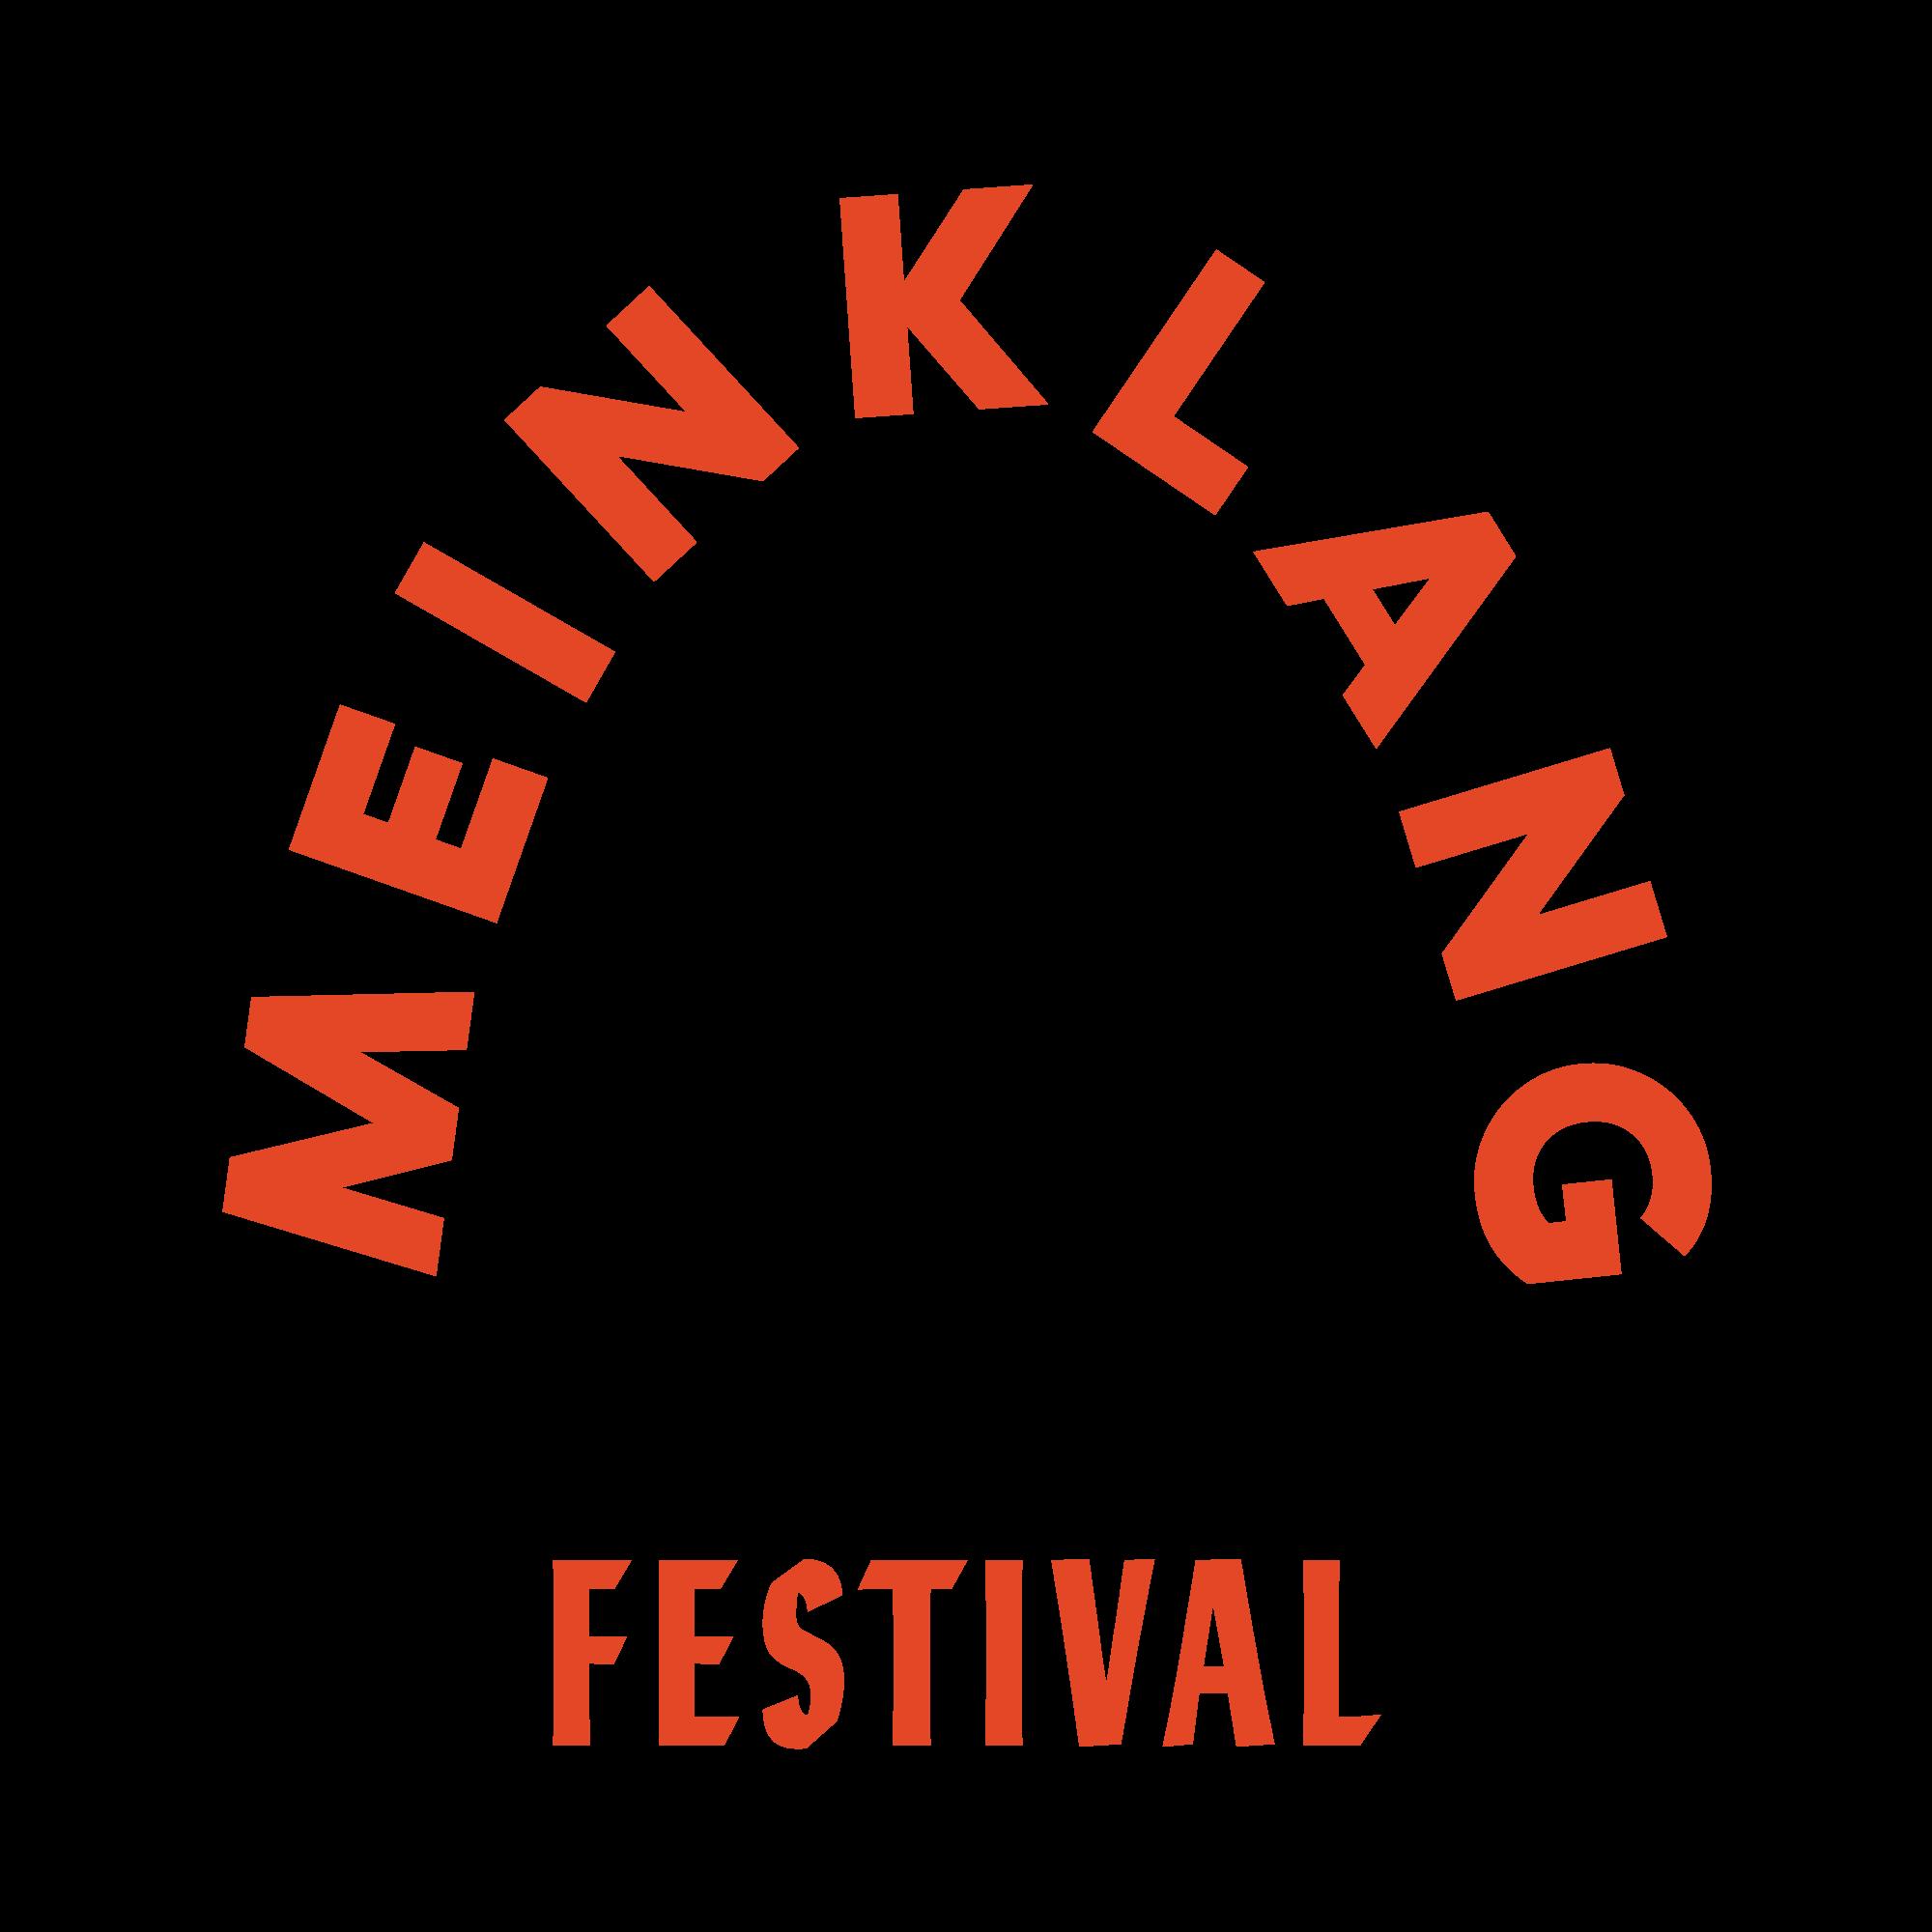 Meinklang Festival